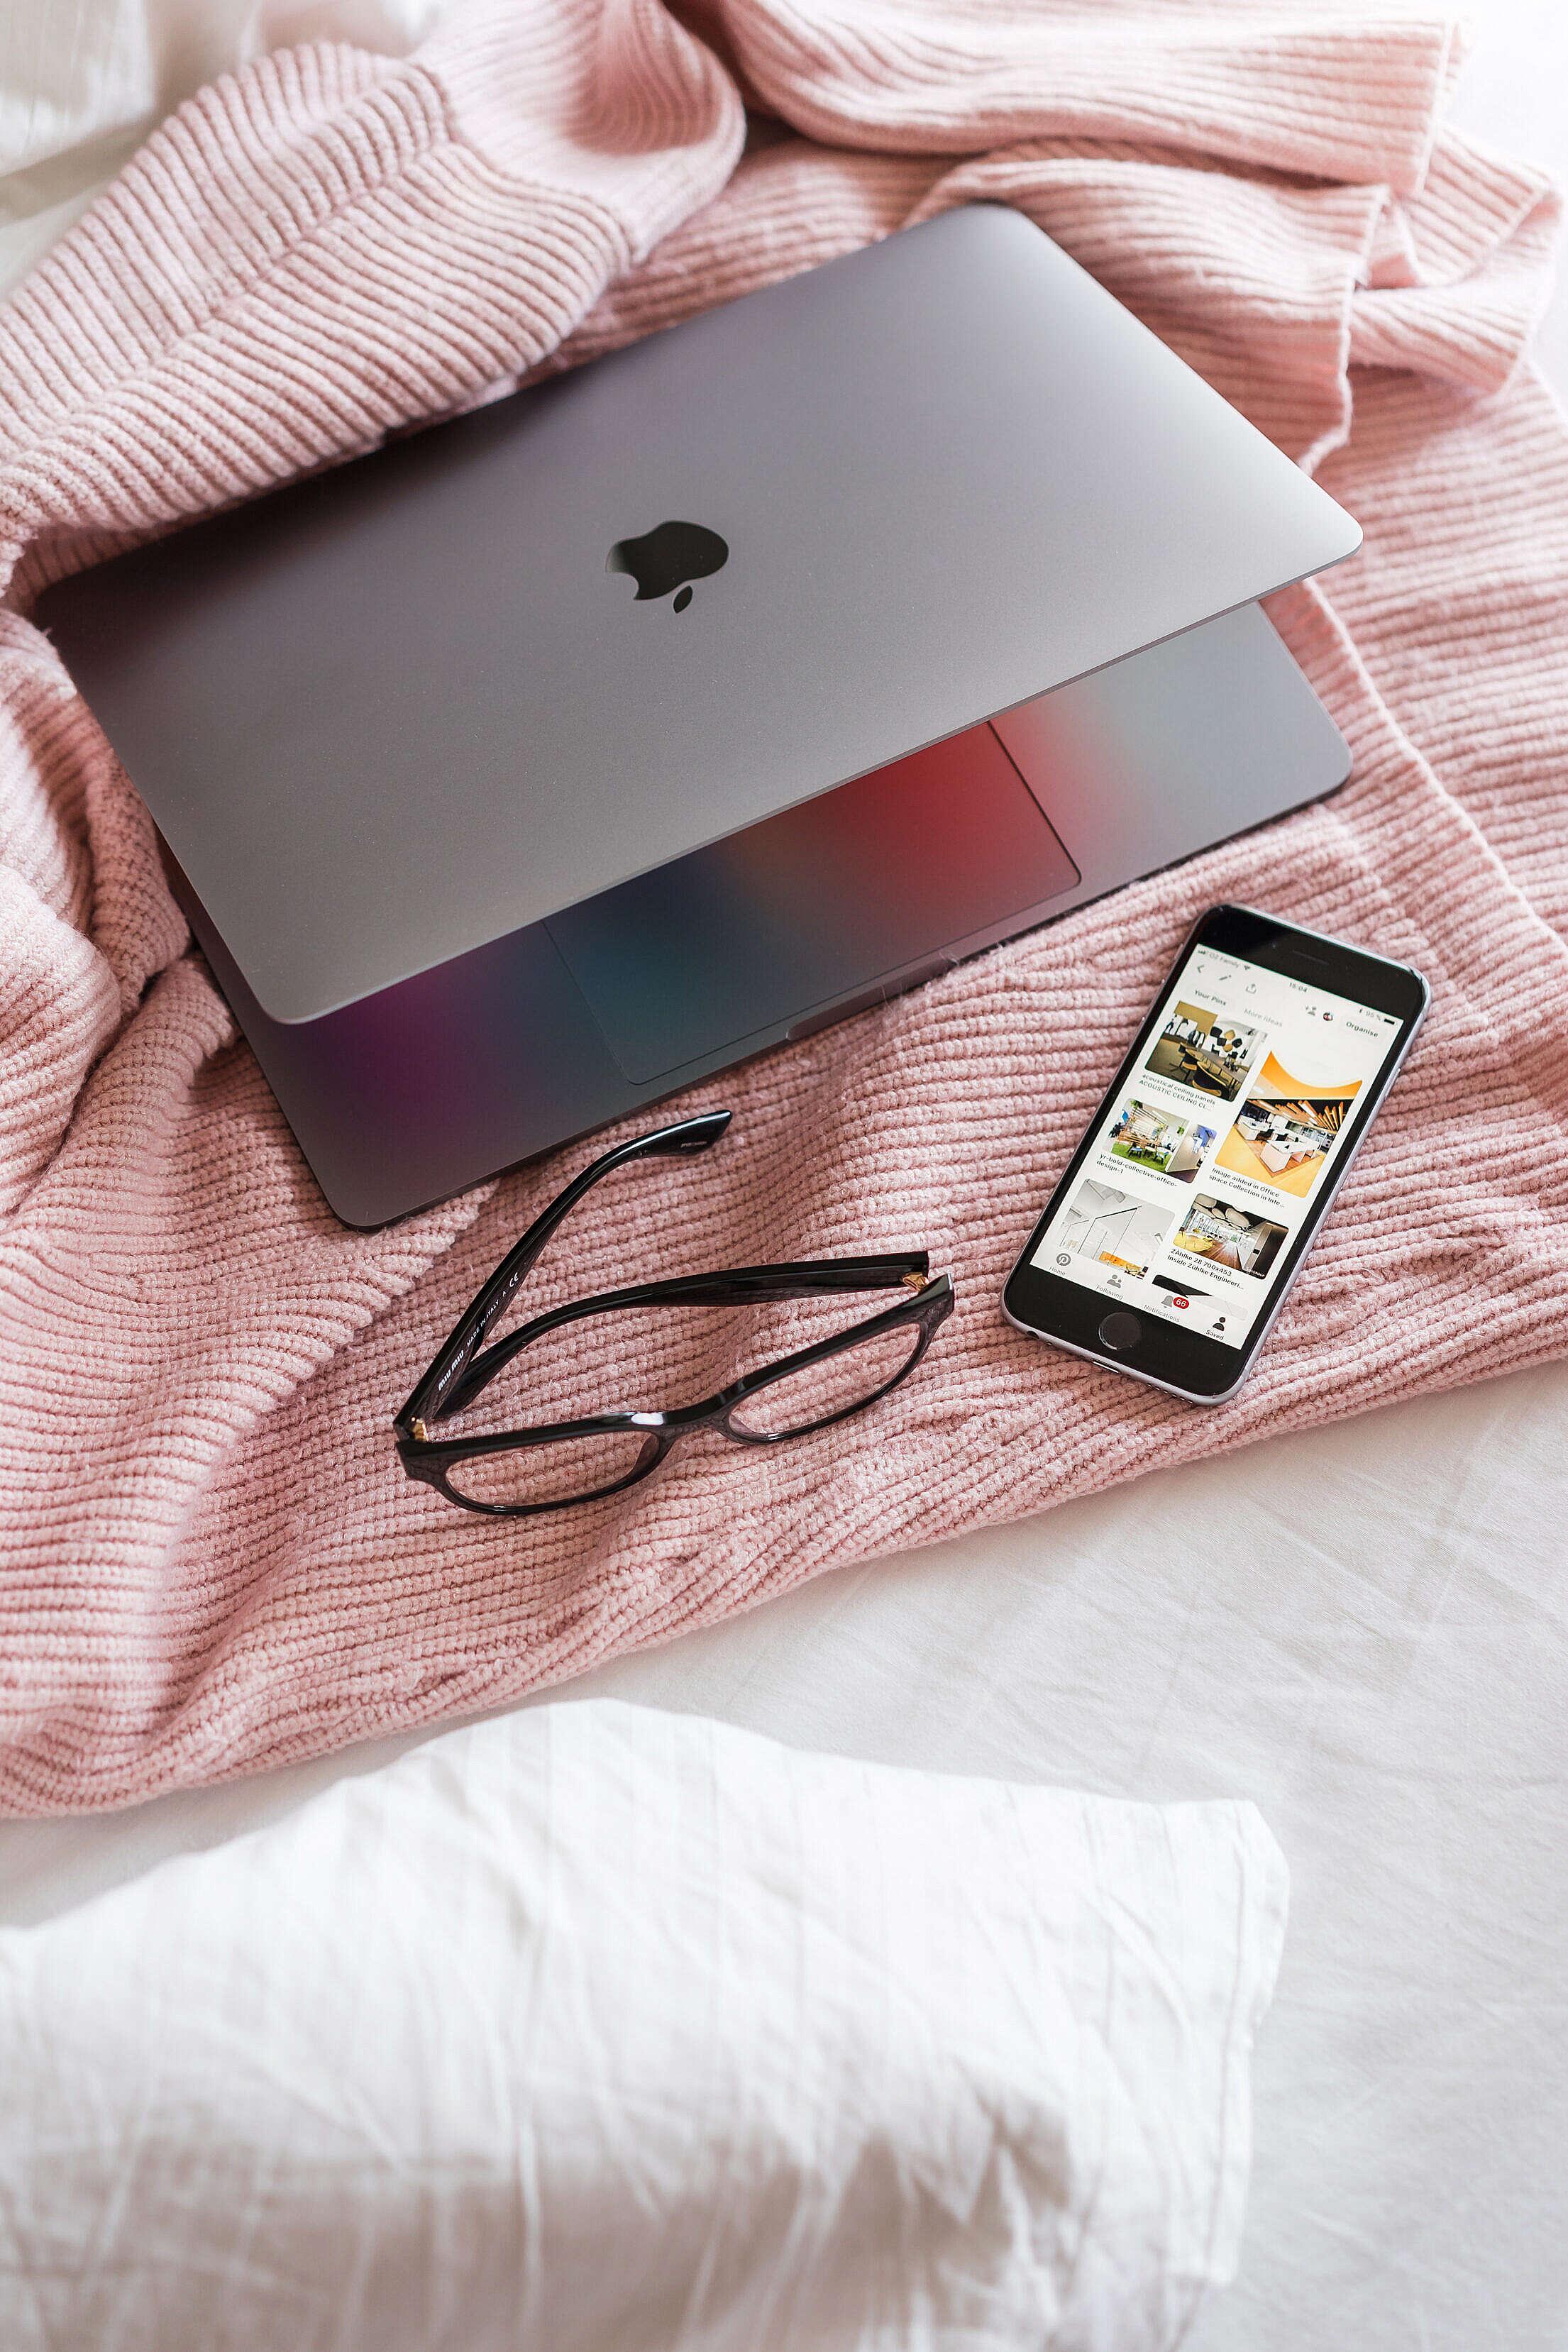 Feminine Ladypreneur Laptop and Smartphone on Bed Free Stock Photo